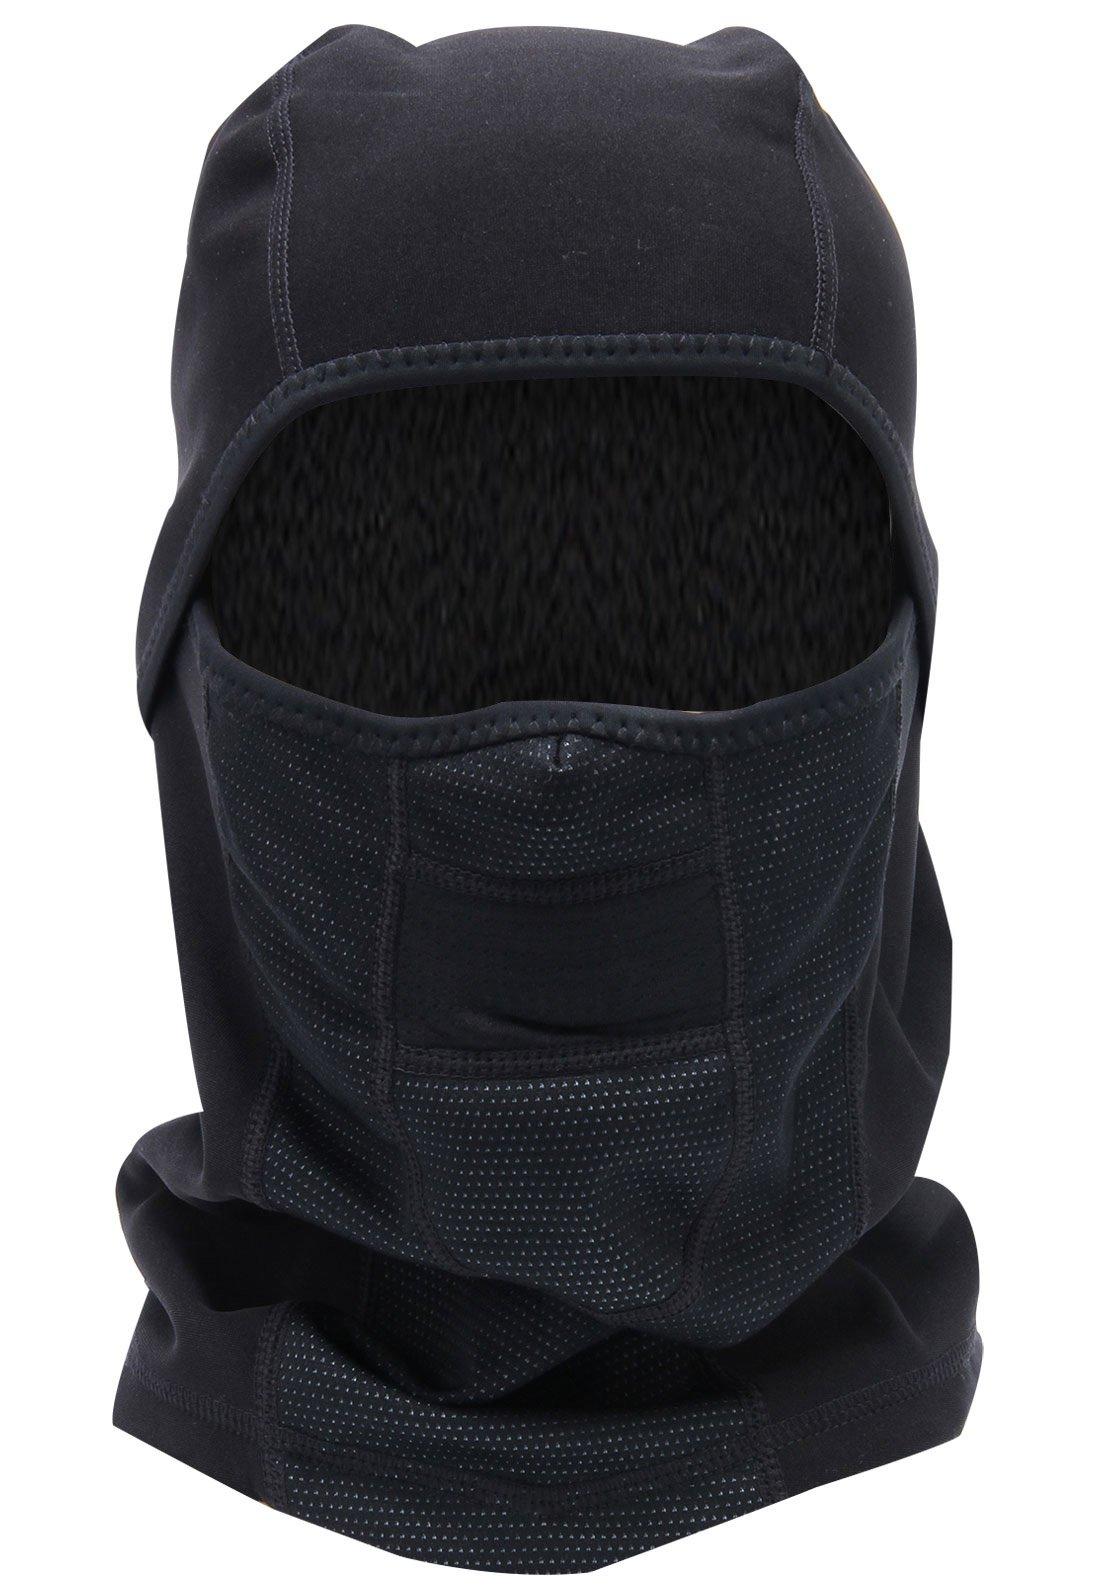 Mens Winter Fleece Cold-Proof Motorcycle Riding Mask Outdoor Hood Neck Warmer - Black